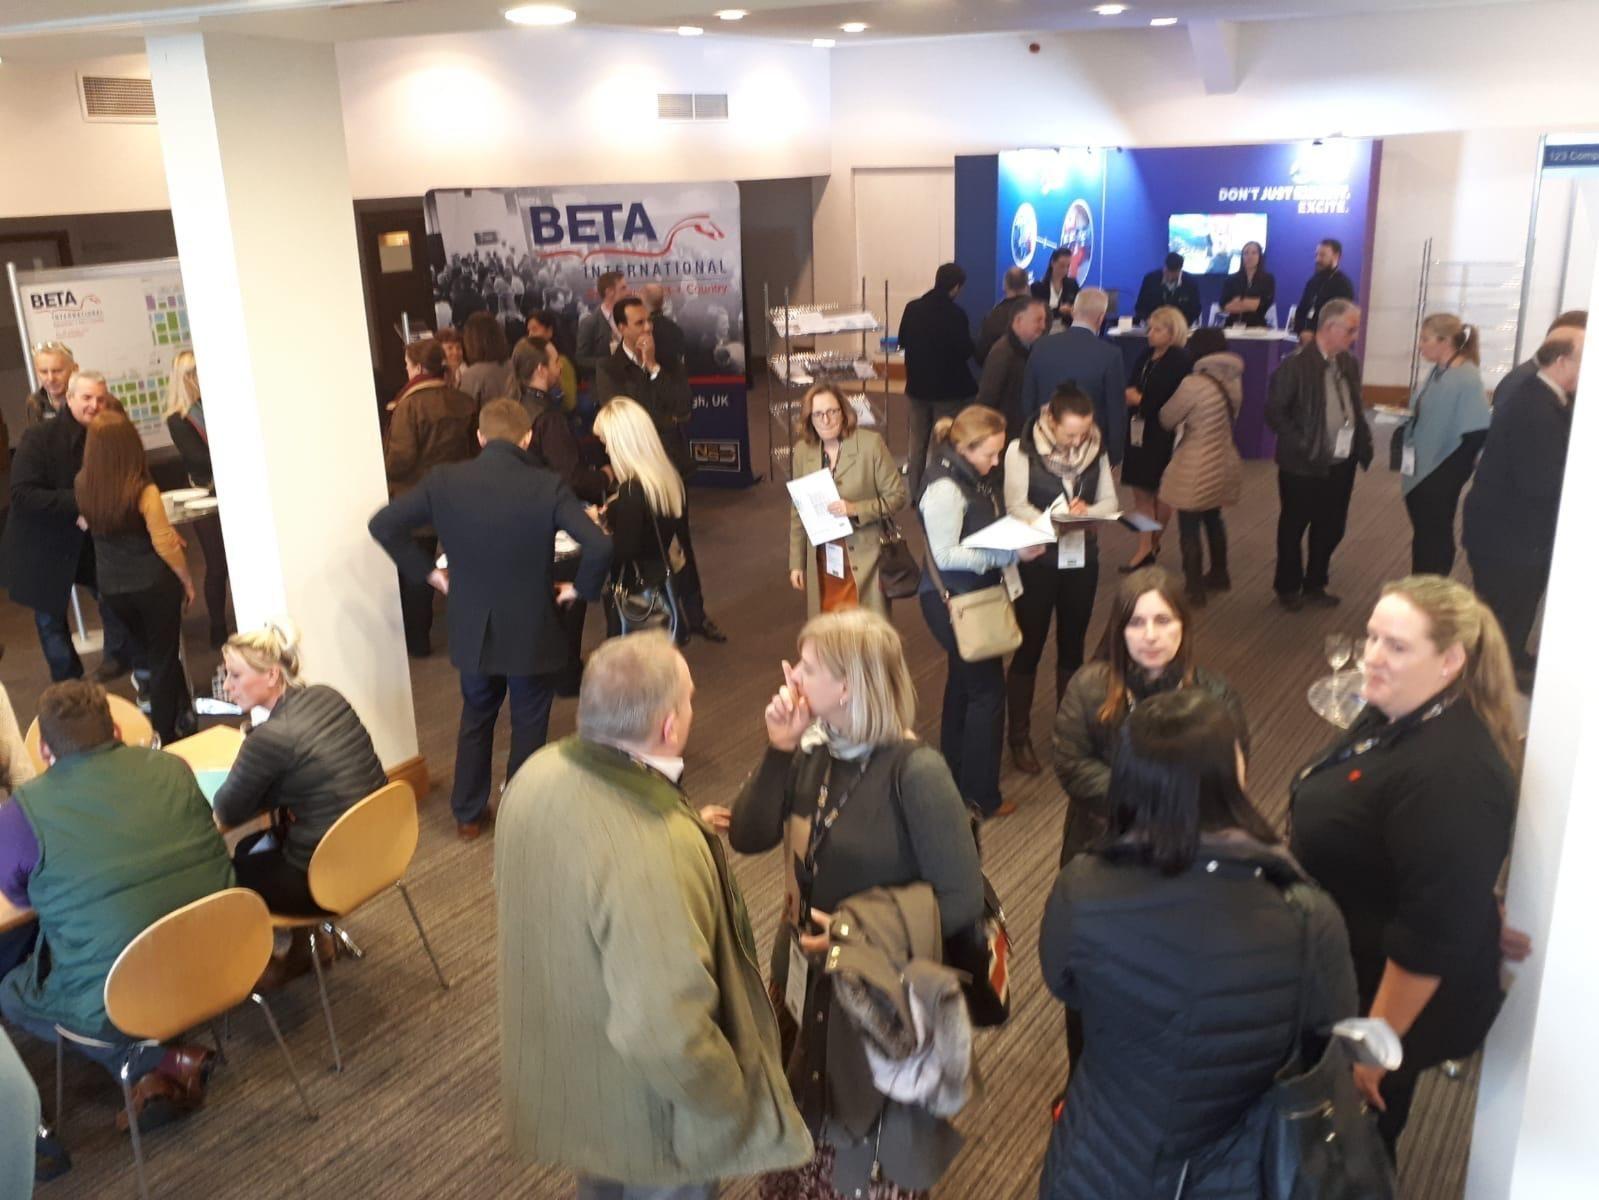 BETA International shares its vision